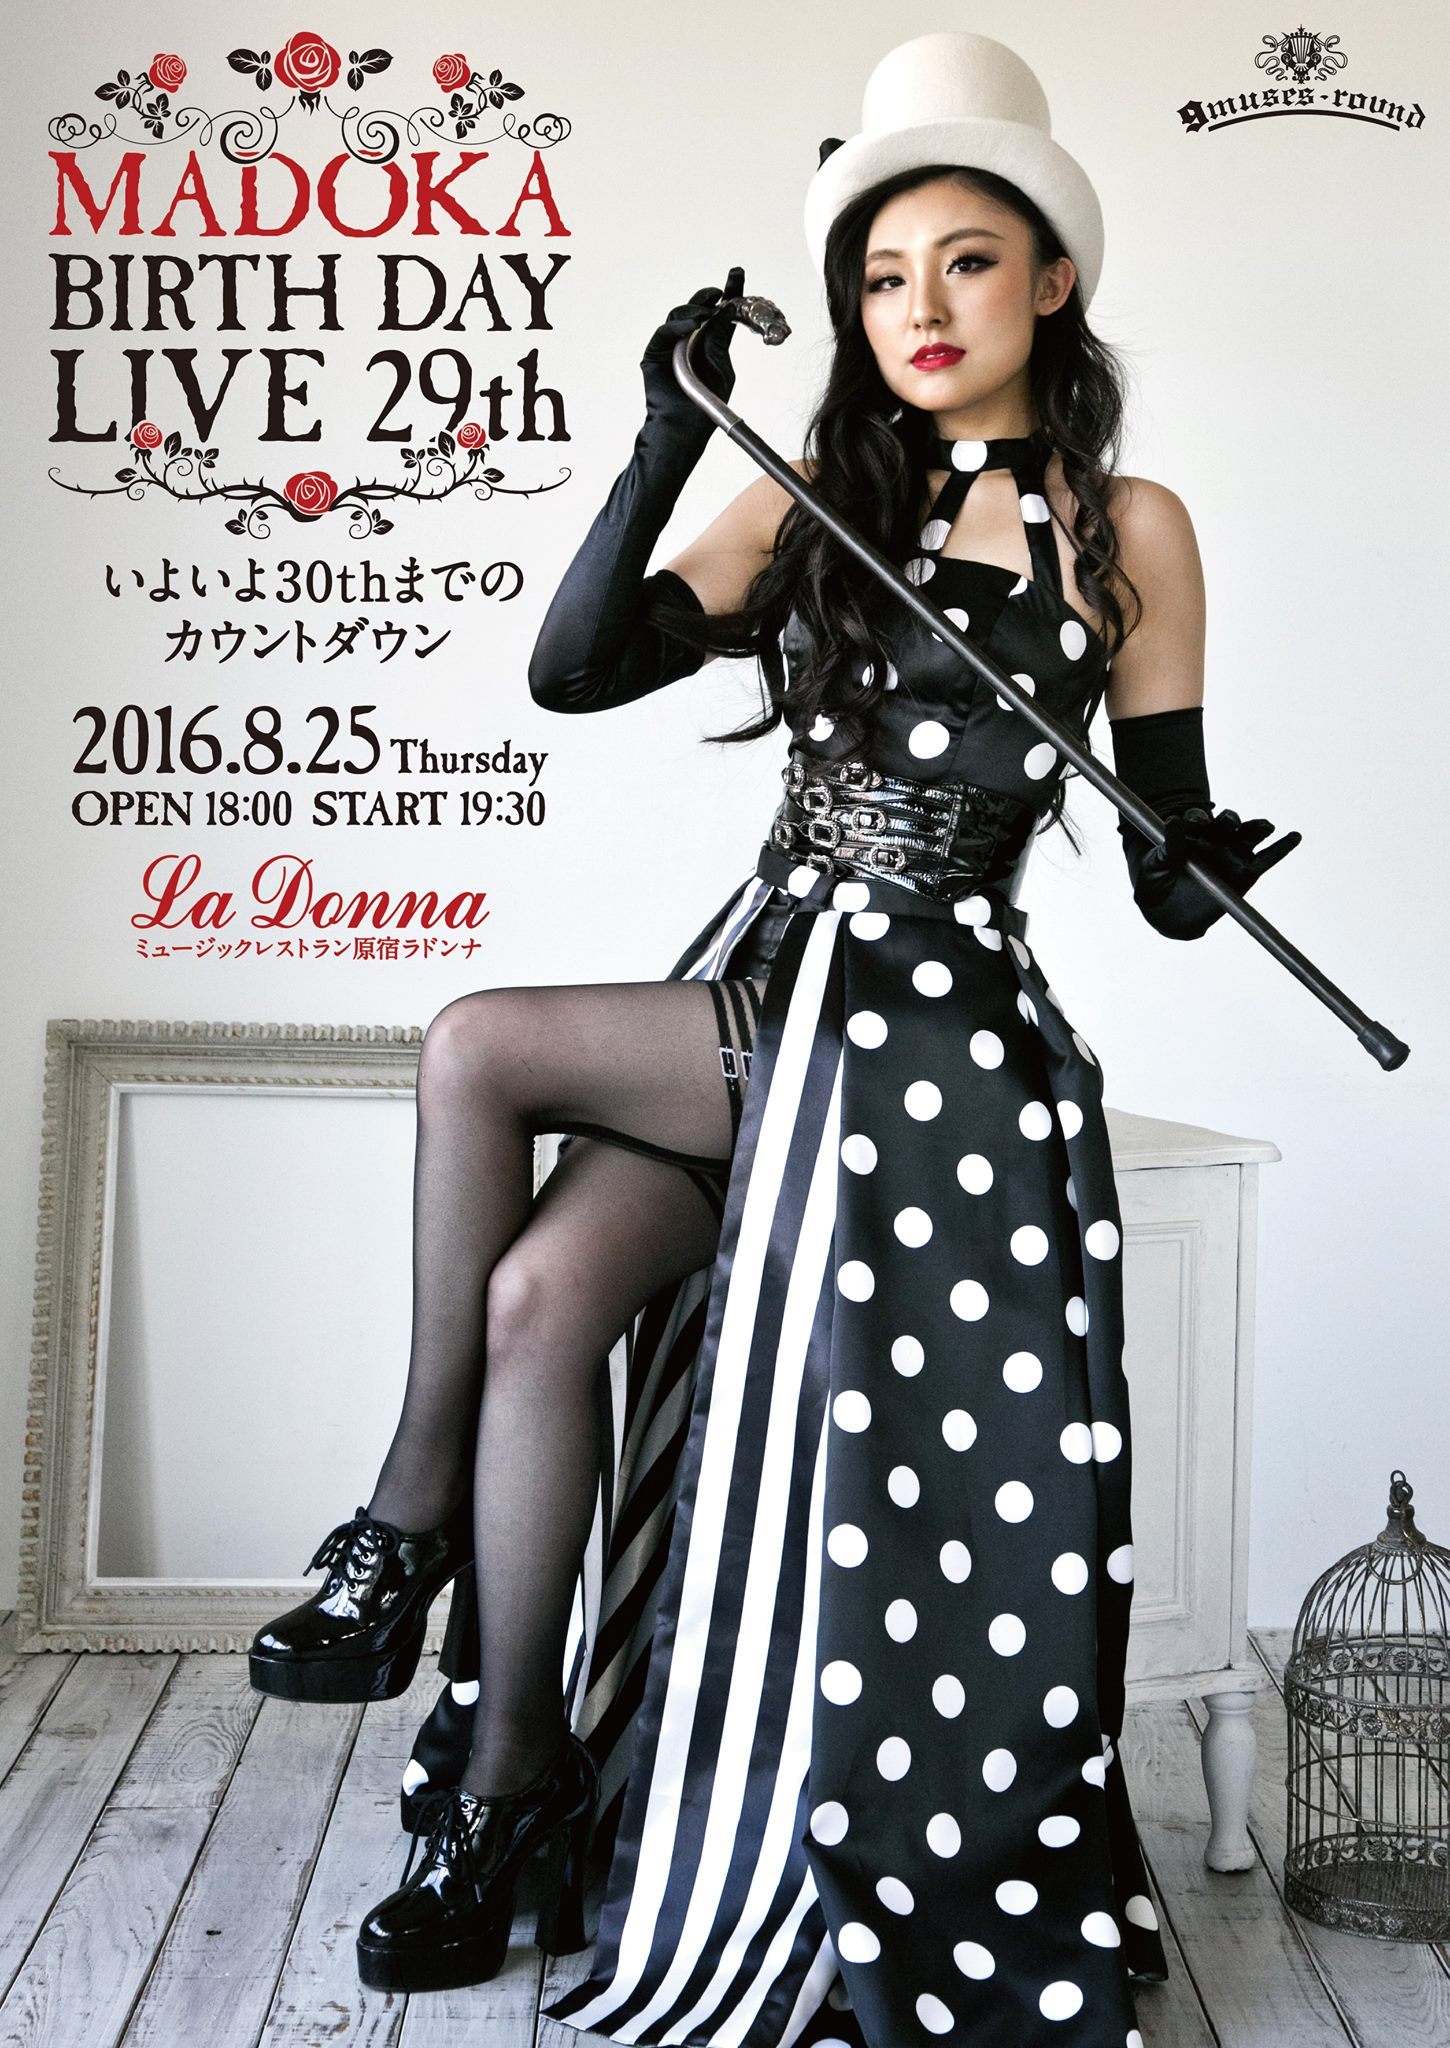 MADOKA BIRTHDAY LIVE 29th